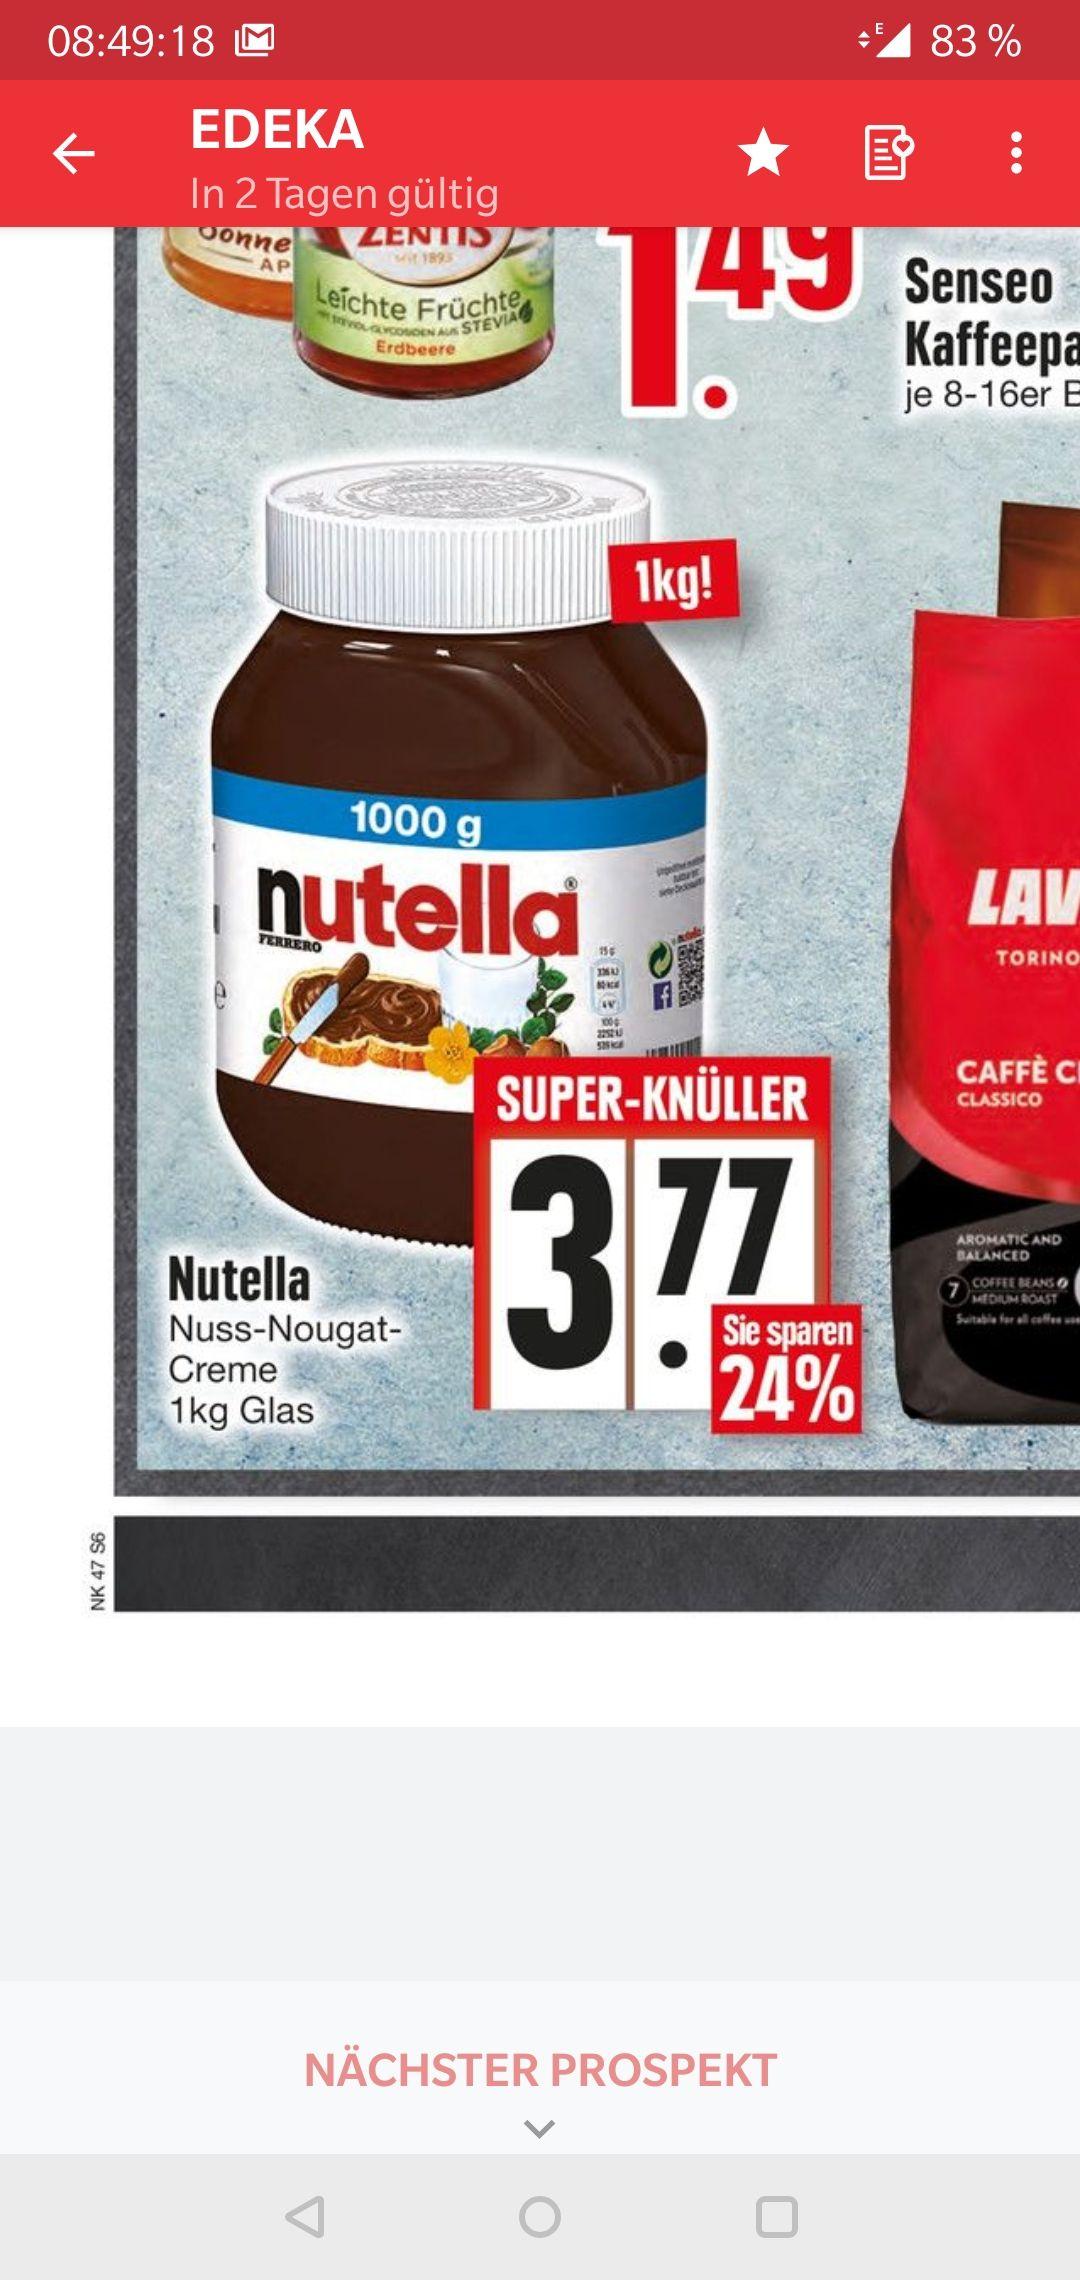 Nutella 1kg Glas